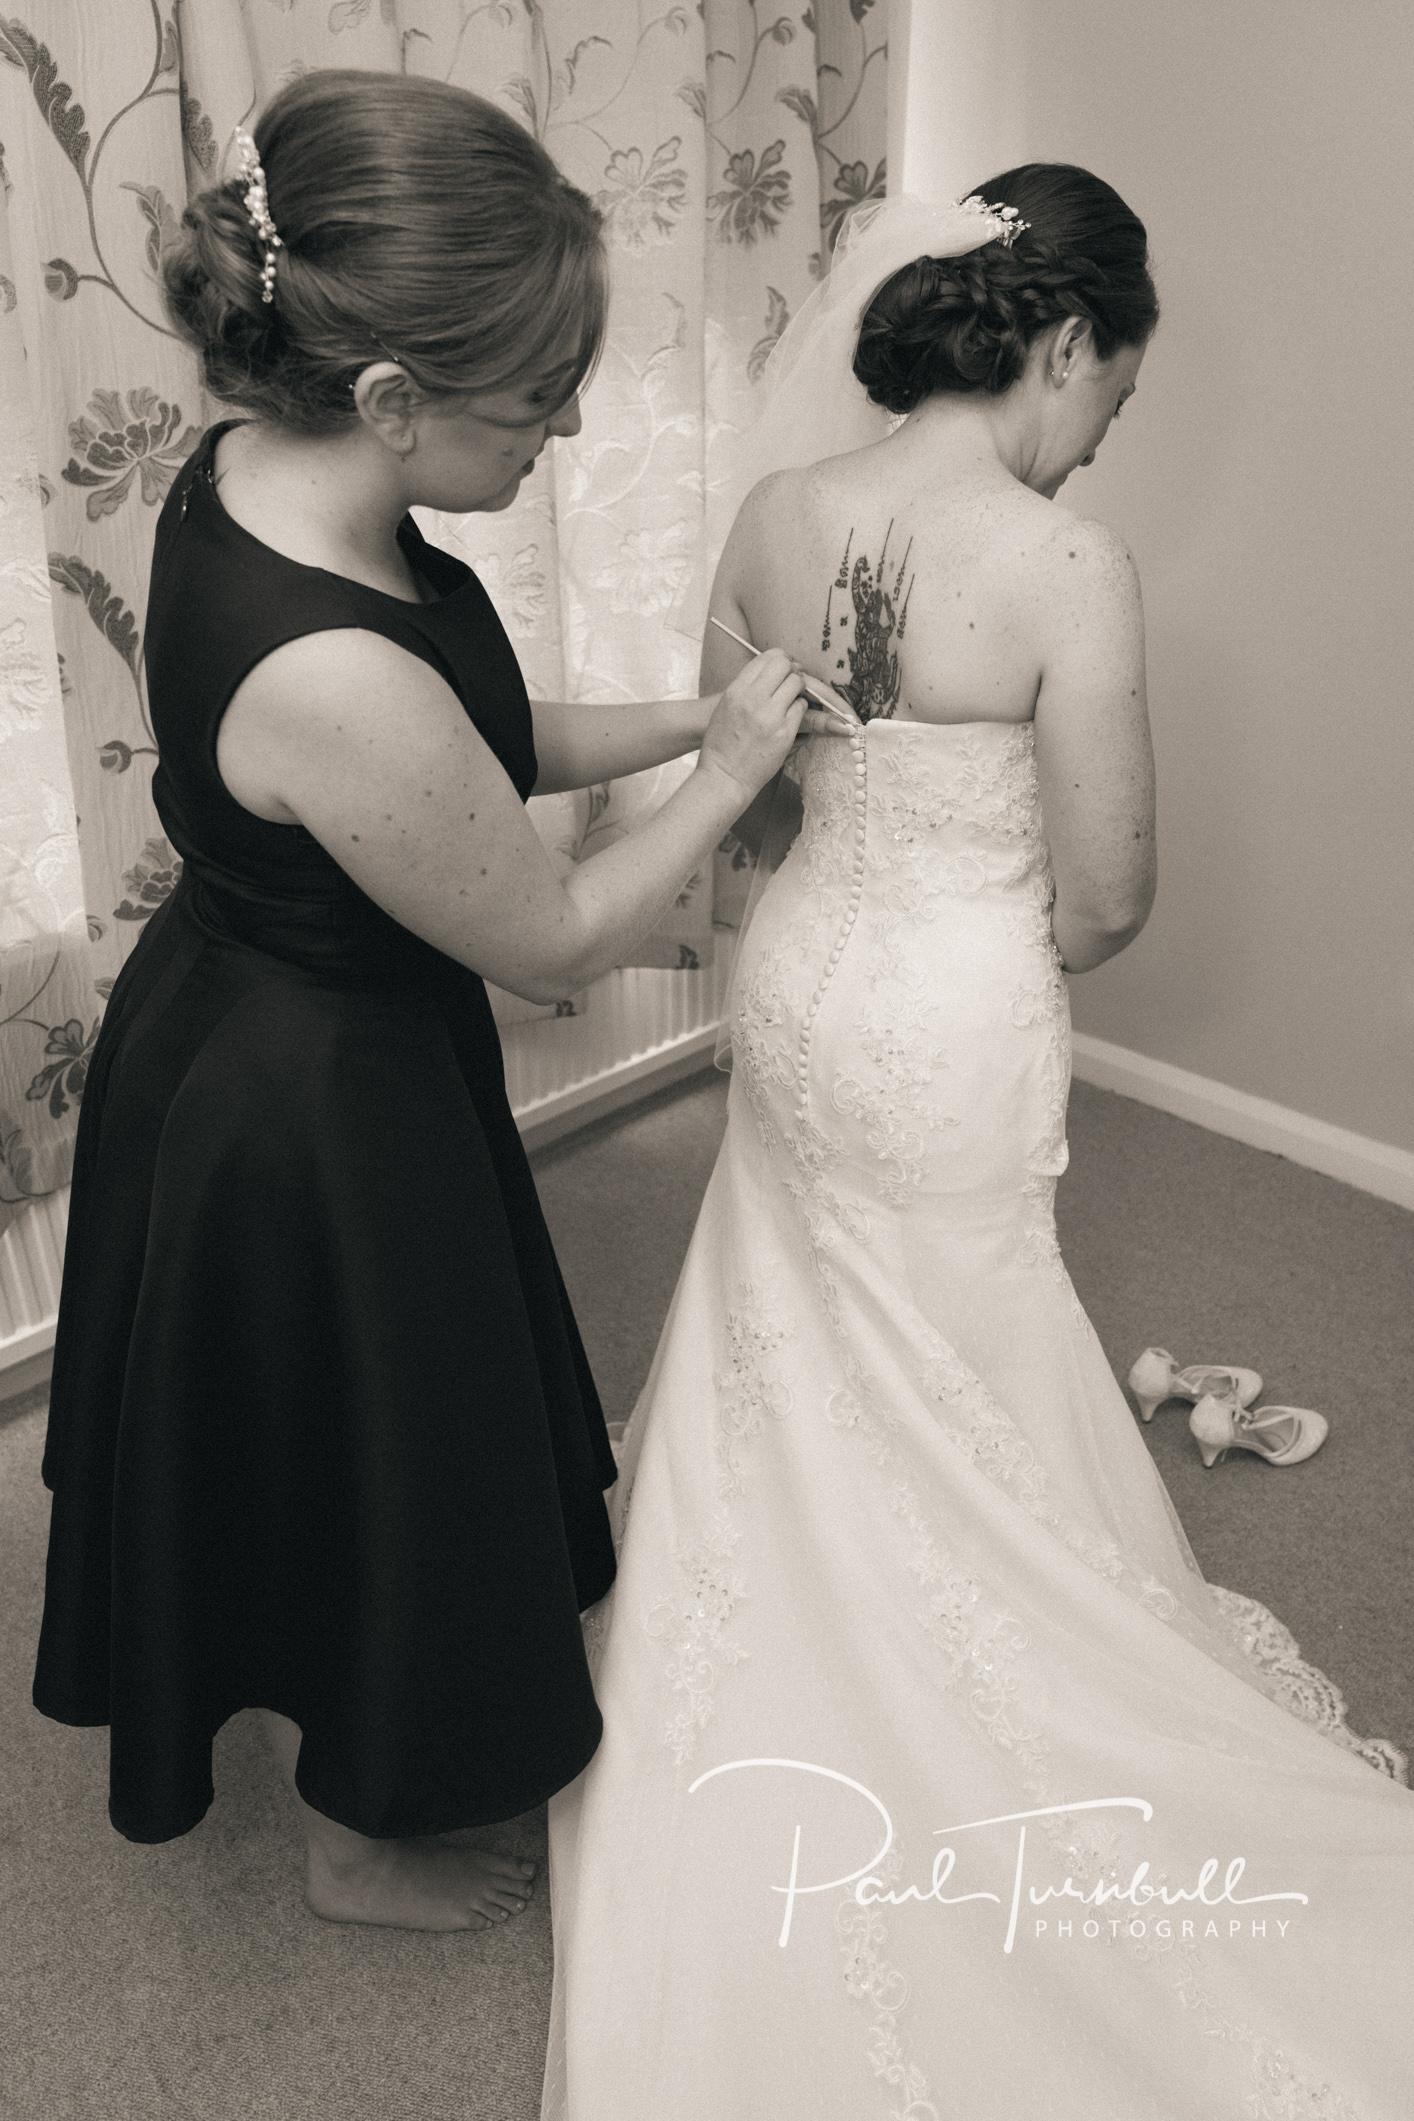 wedding-photographer-south-dalton-walkington-yorkshire-emma-james-014.jpg